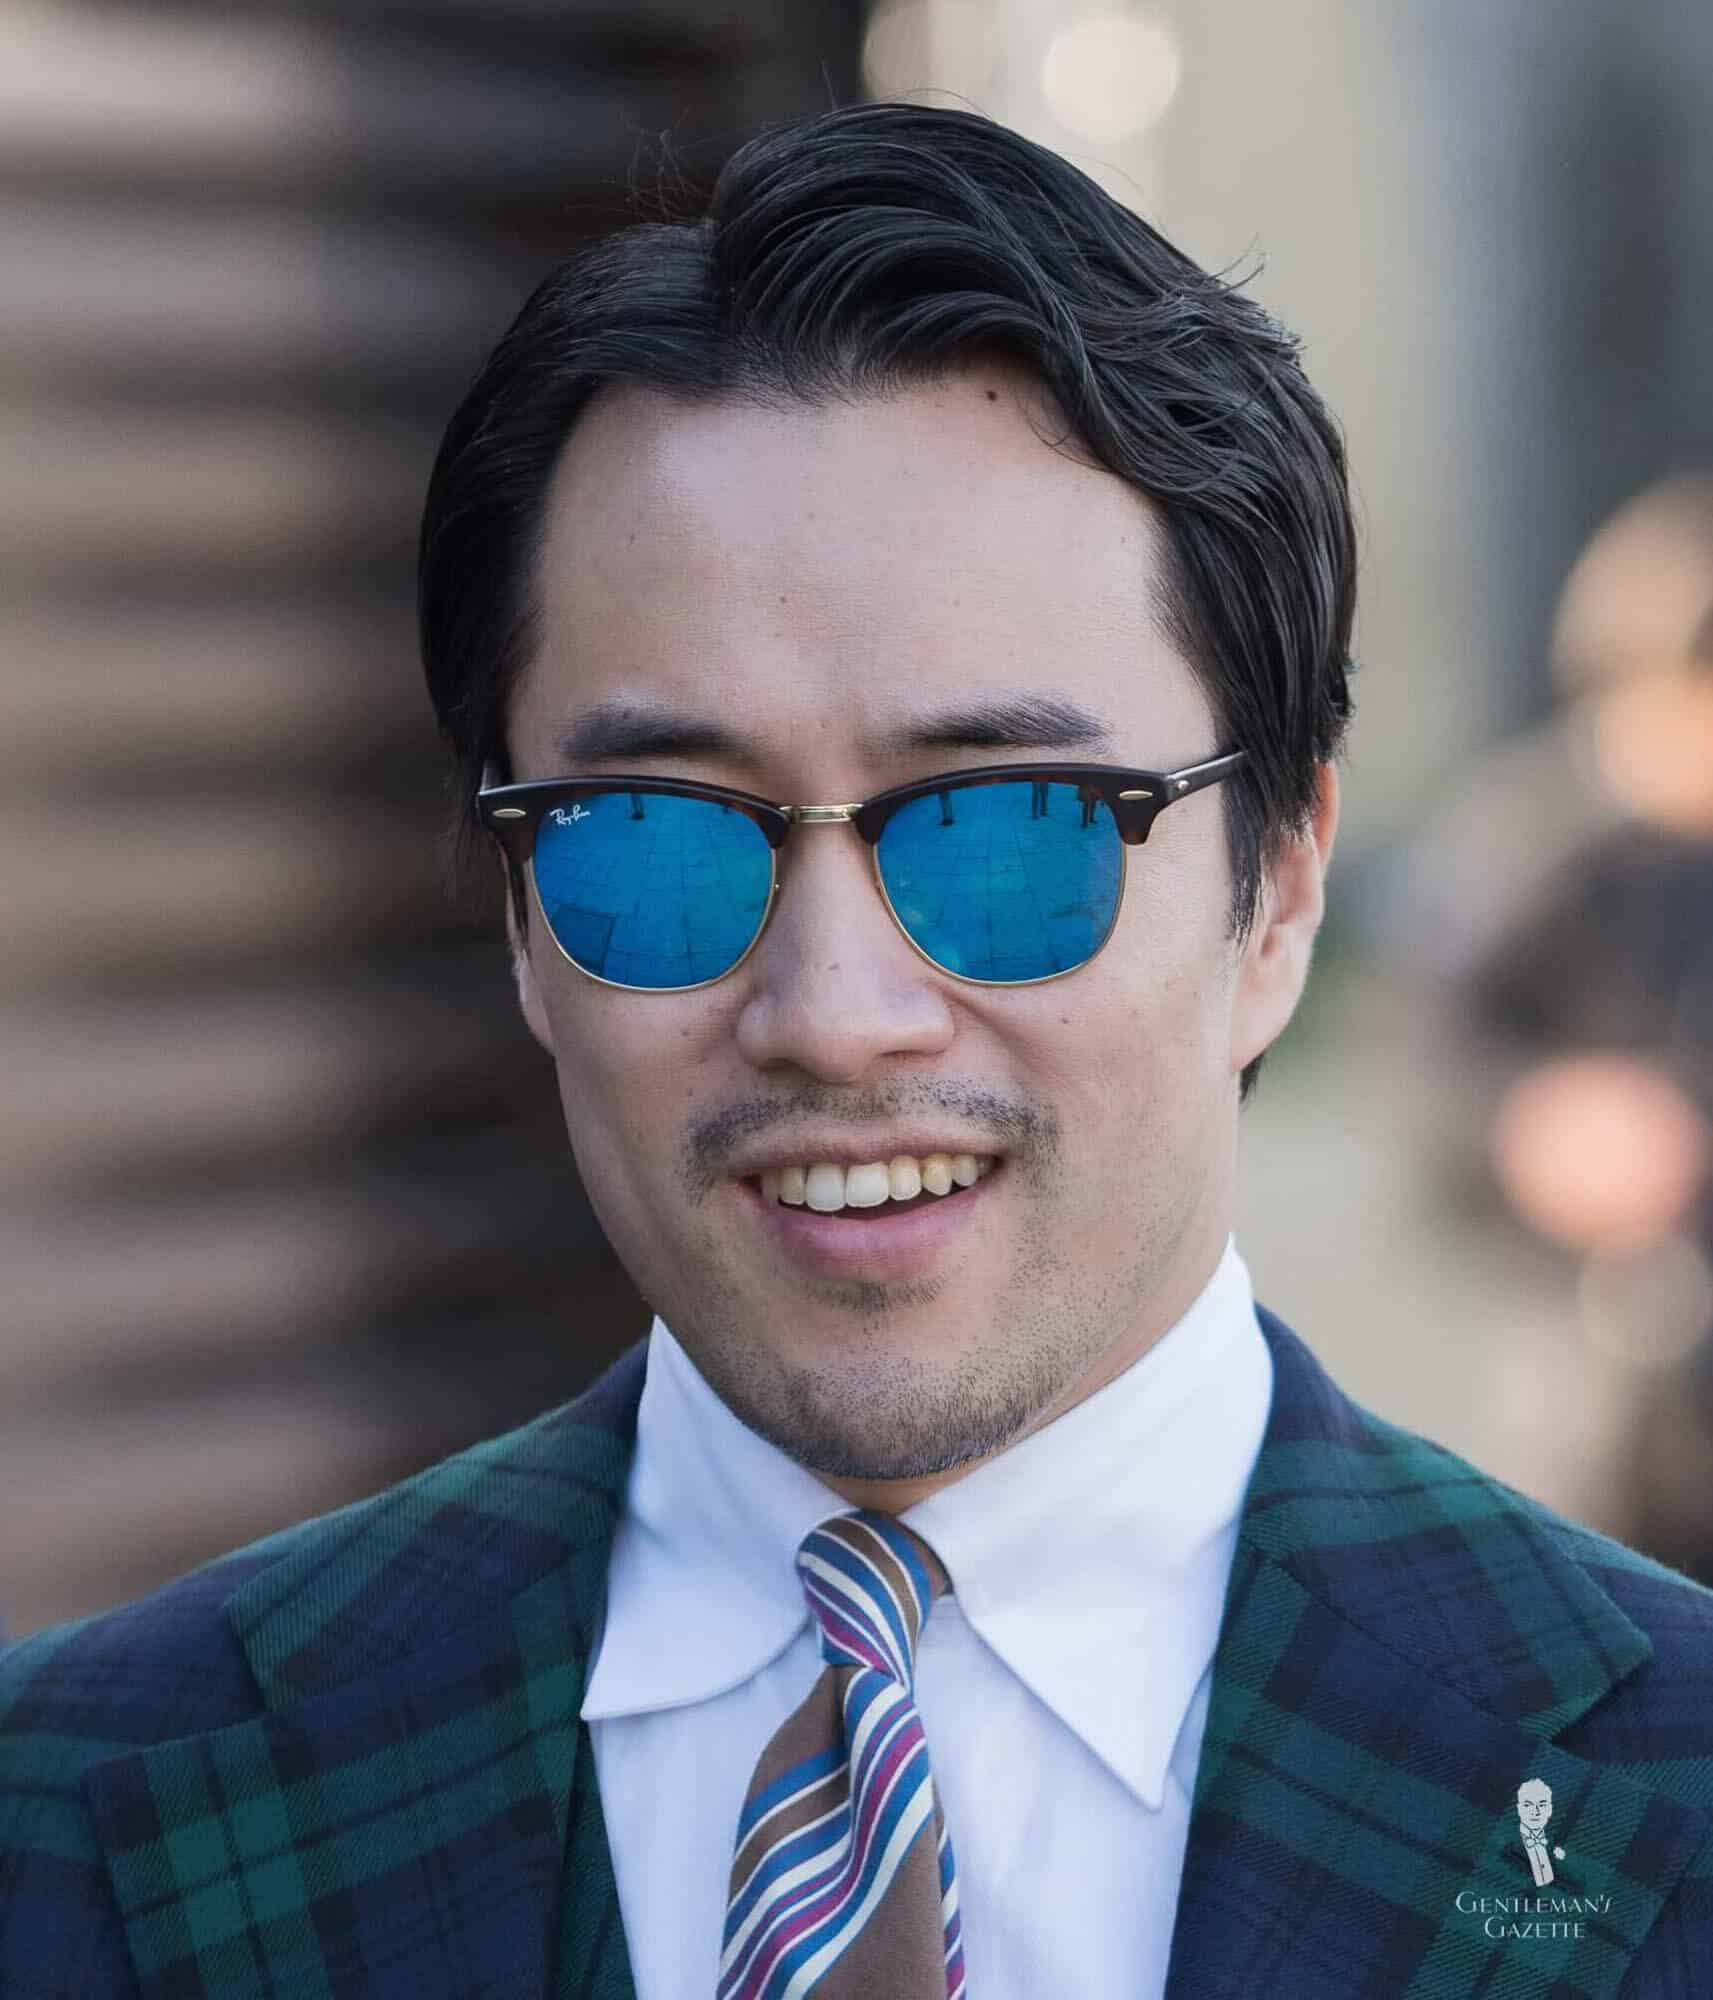 Clubmaster Sunglasses Amp Browline Style Primer Gentleman